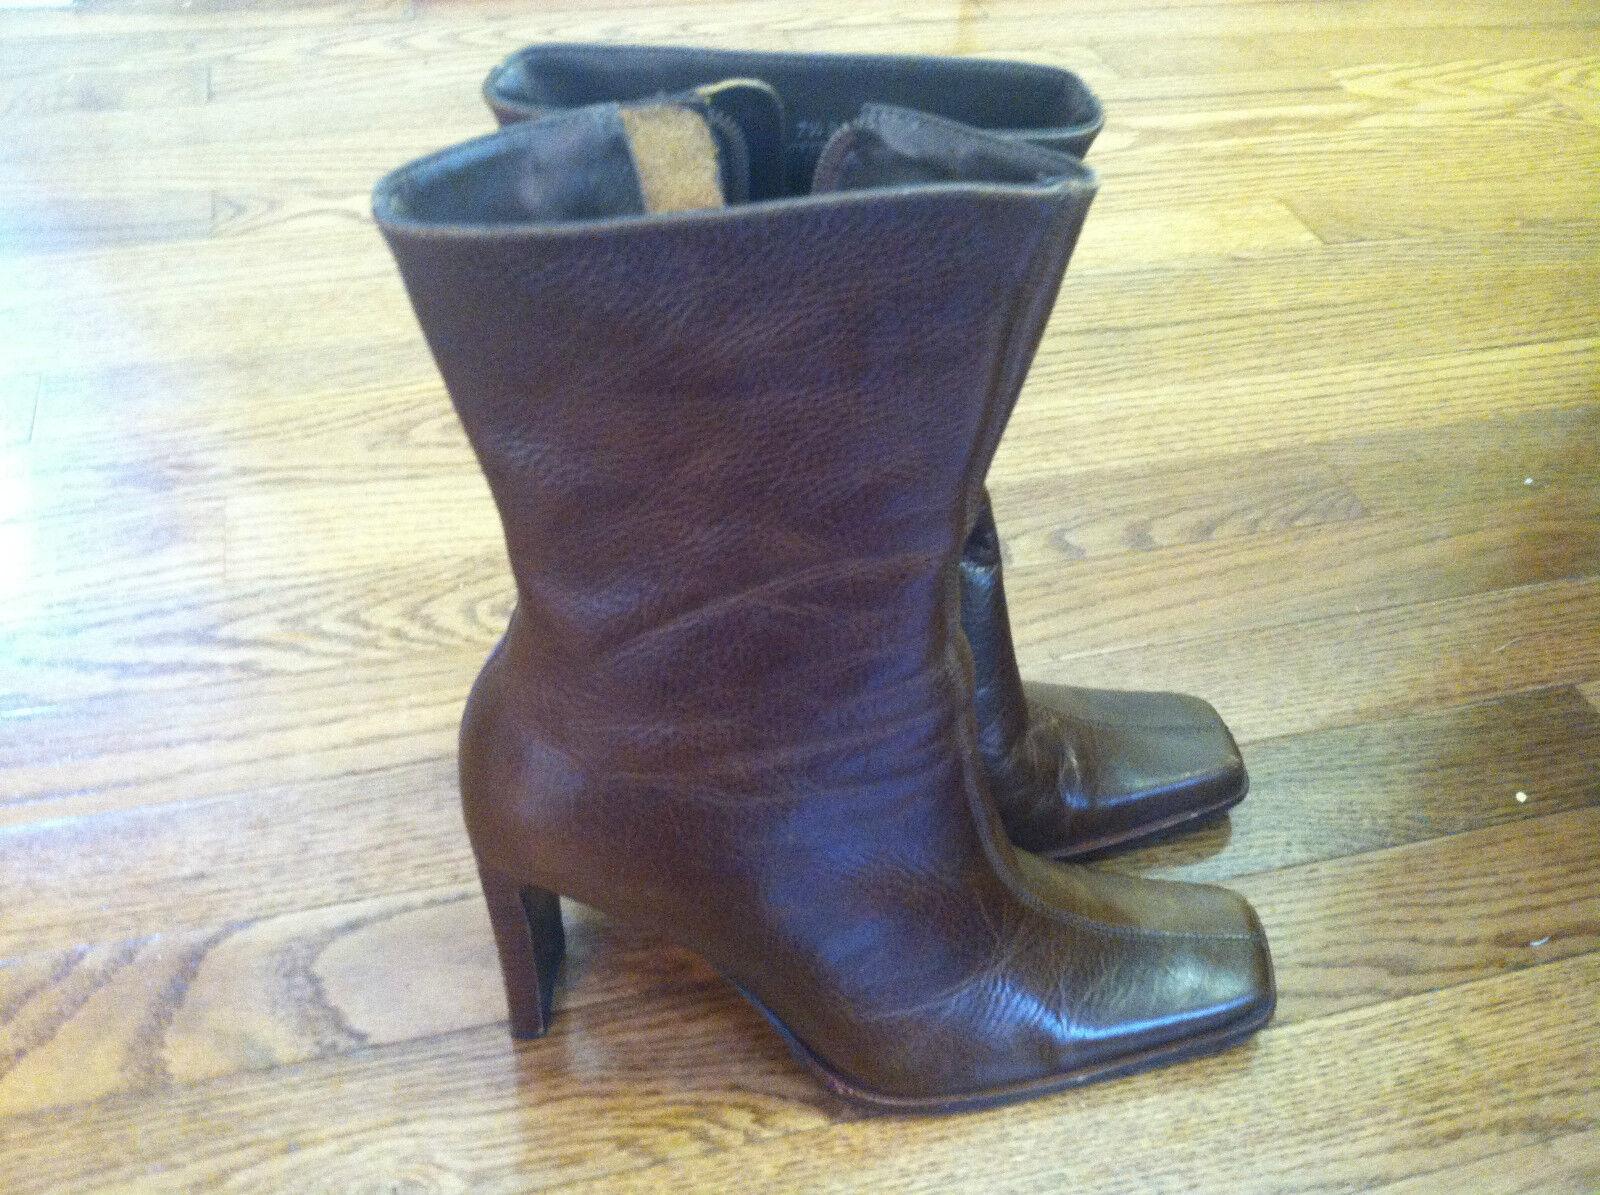 Steve Madden Boots leather high heel 7.5 Brown winter dress woman's ladies girls